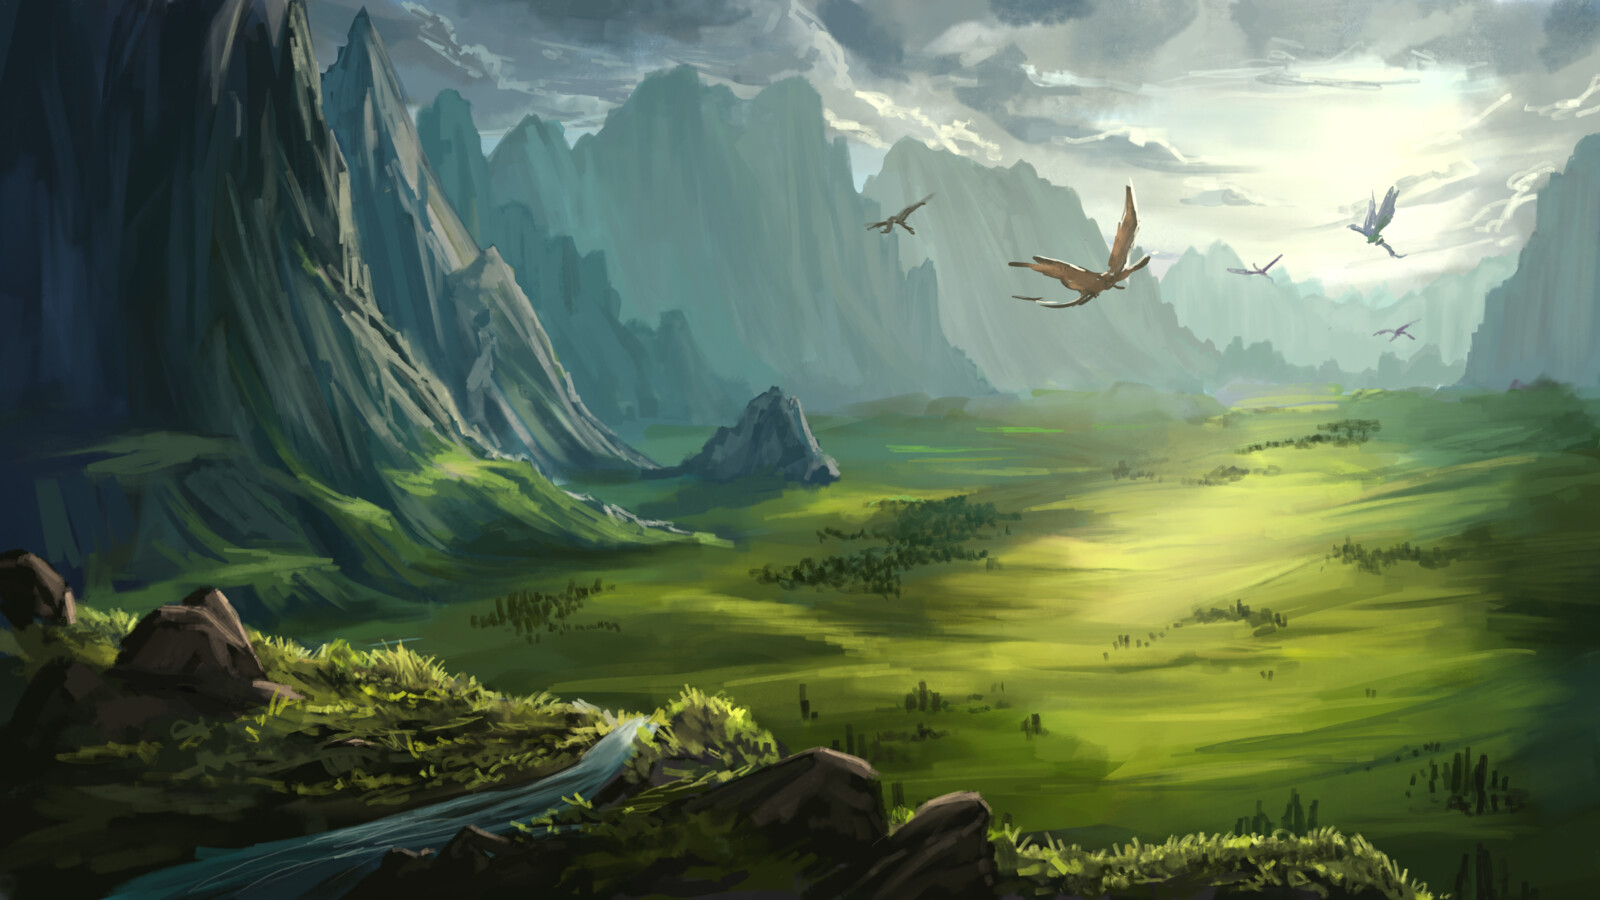 The Waypass Mountains